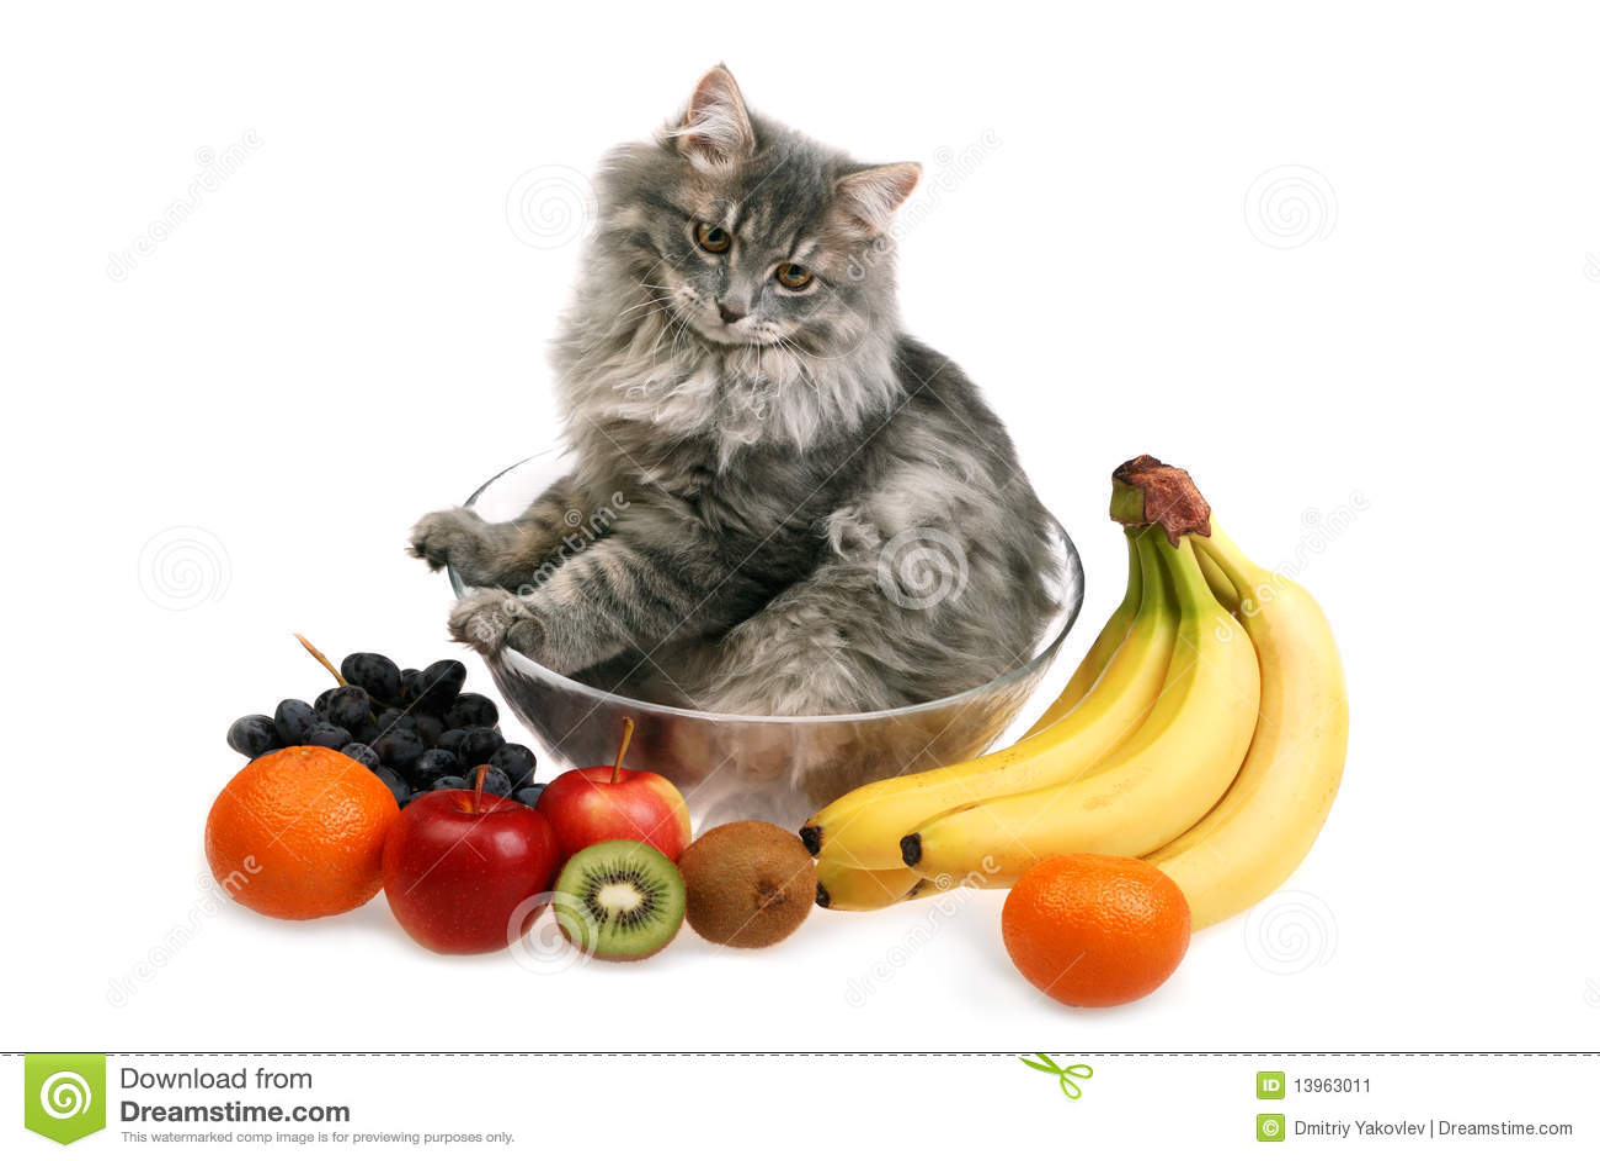 Fruity Cat